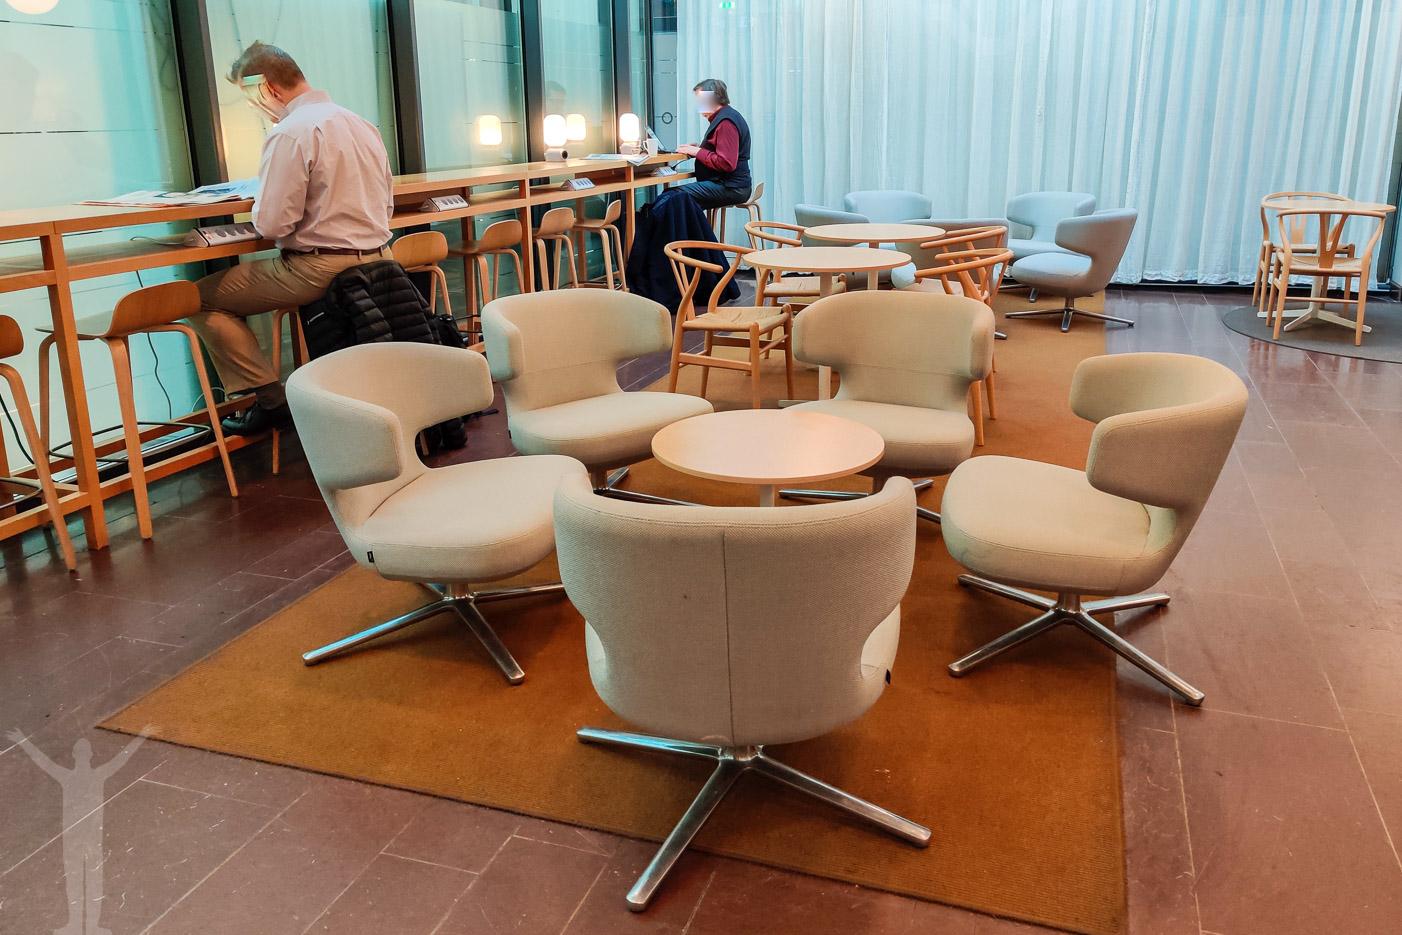 SJ Lounge på Göteborg Centralstation